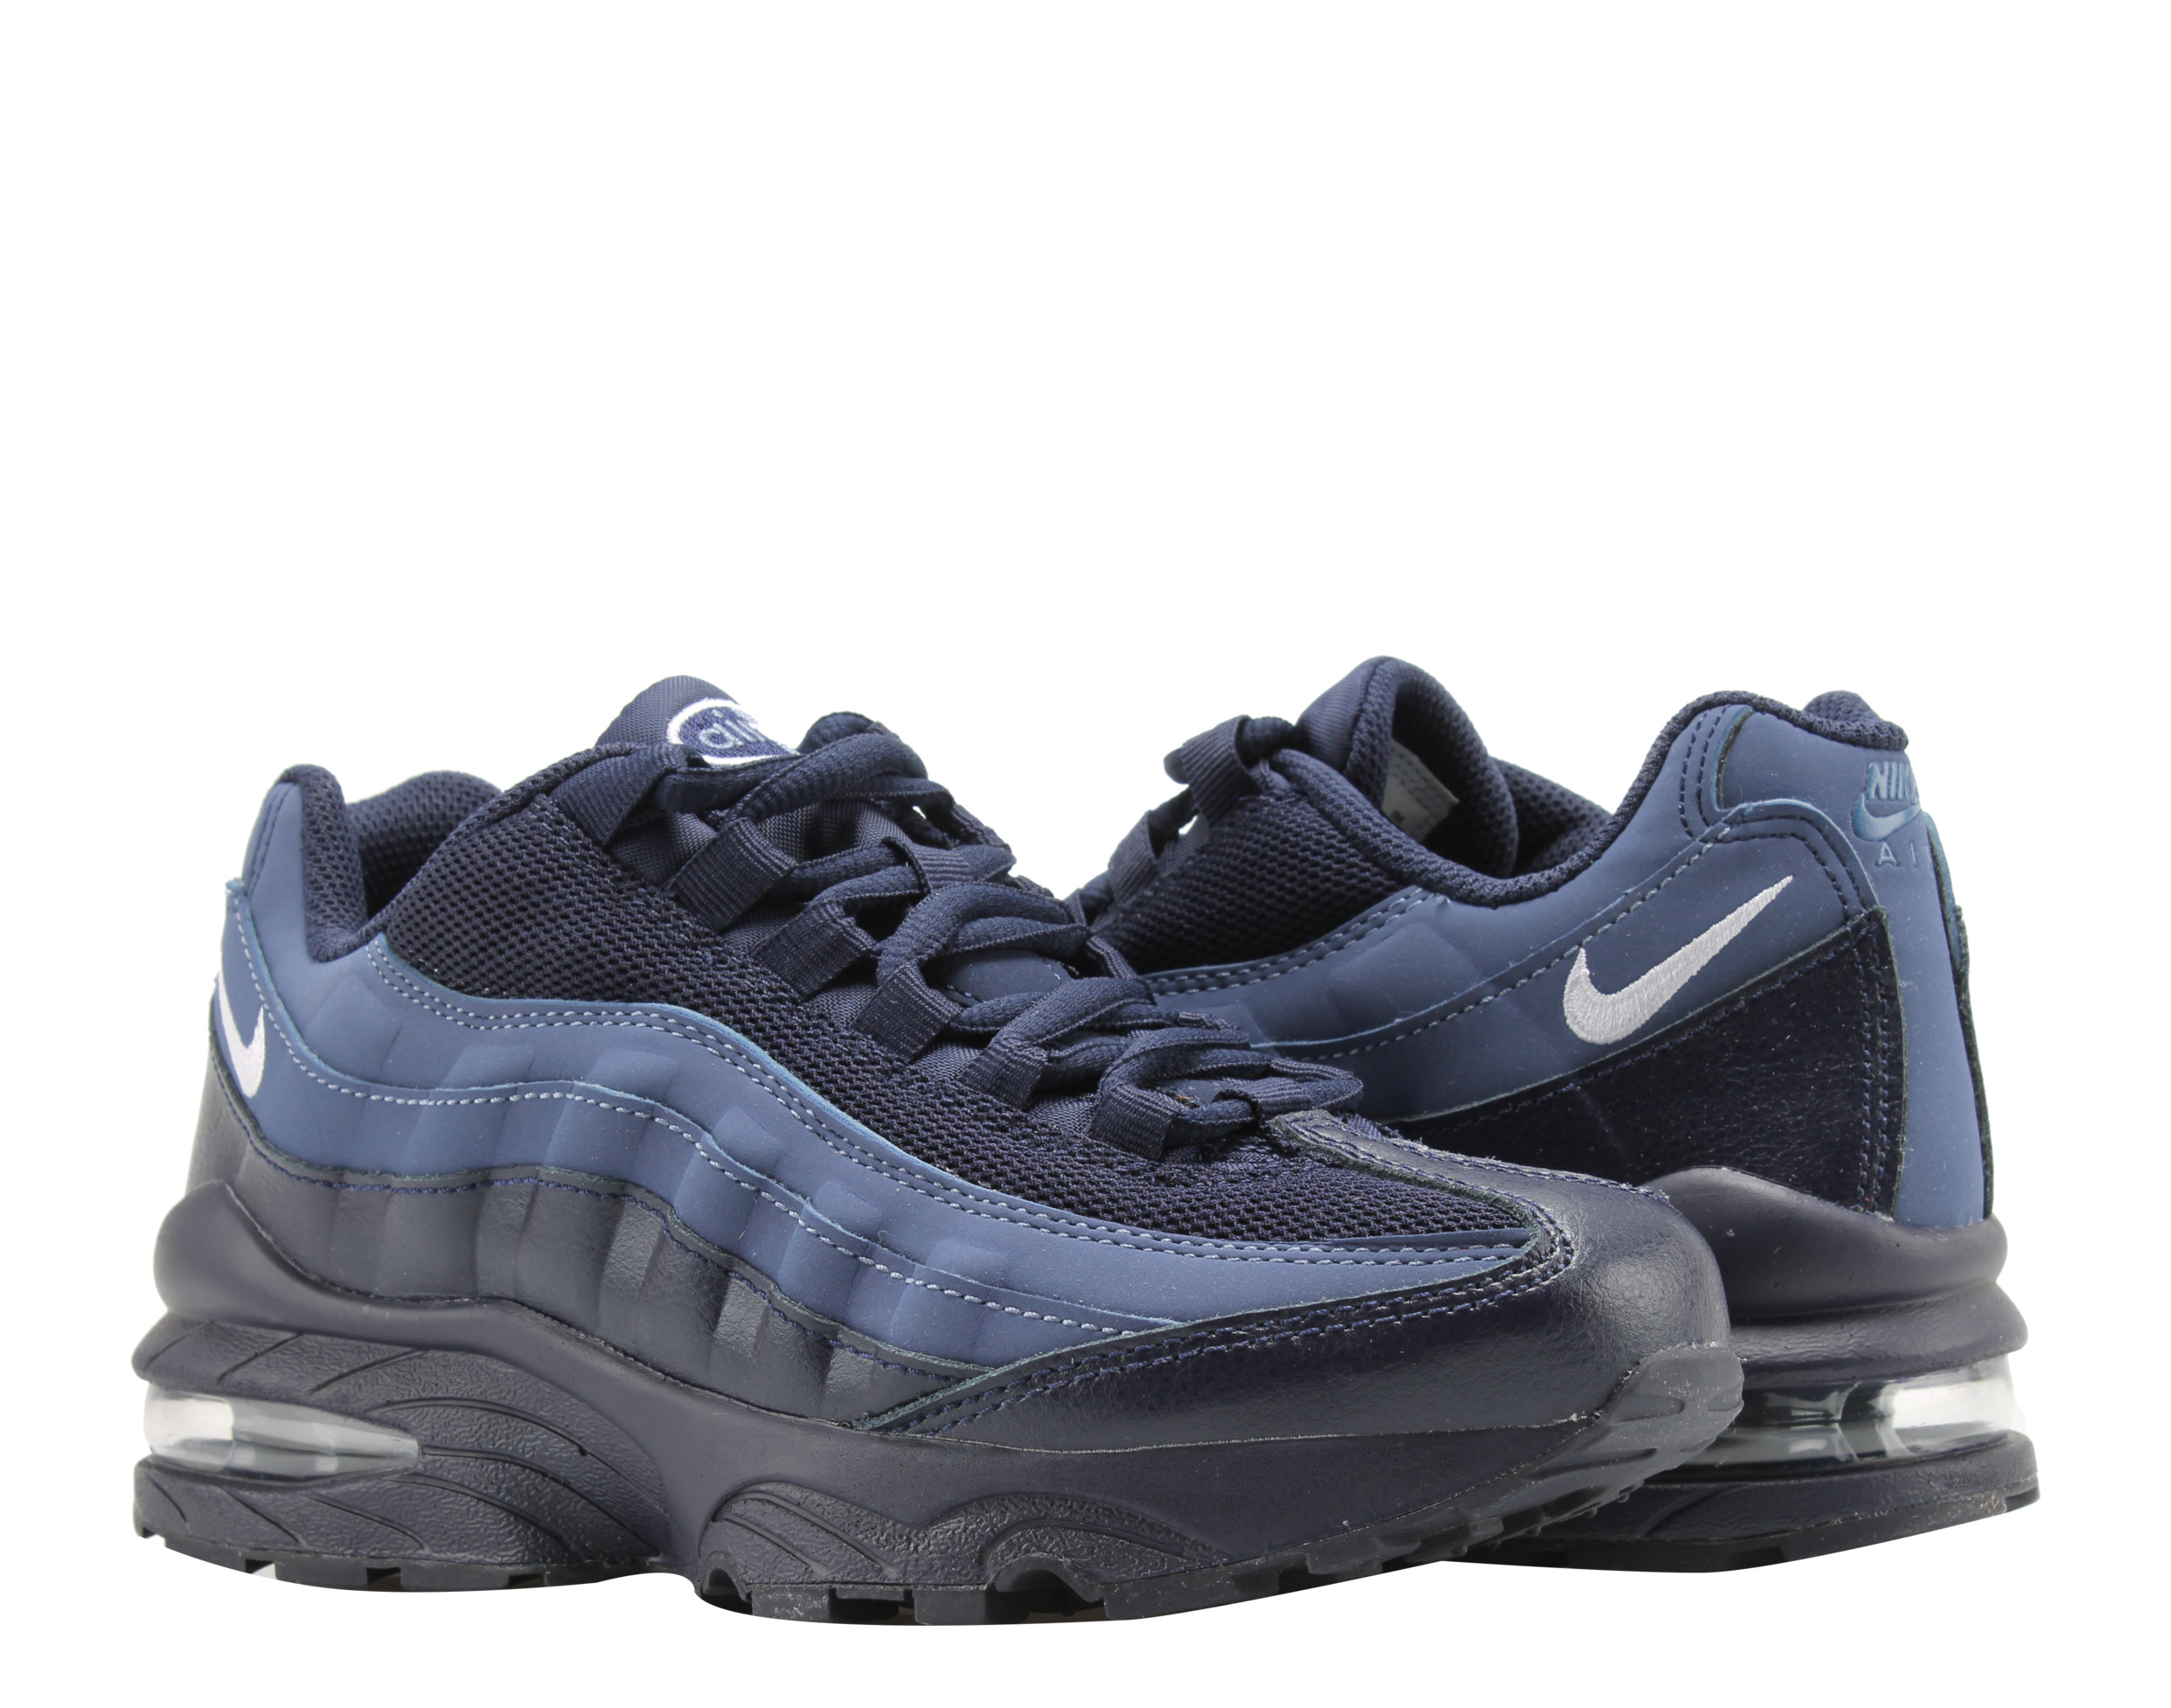 Nike - Nike Air Max '95 GS Blackened Blue/White Big Kids Running Shoes 307565-410 - Walmart.com